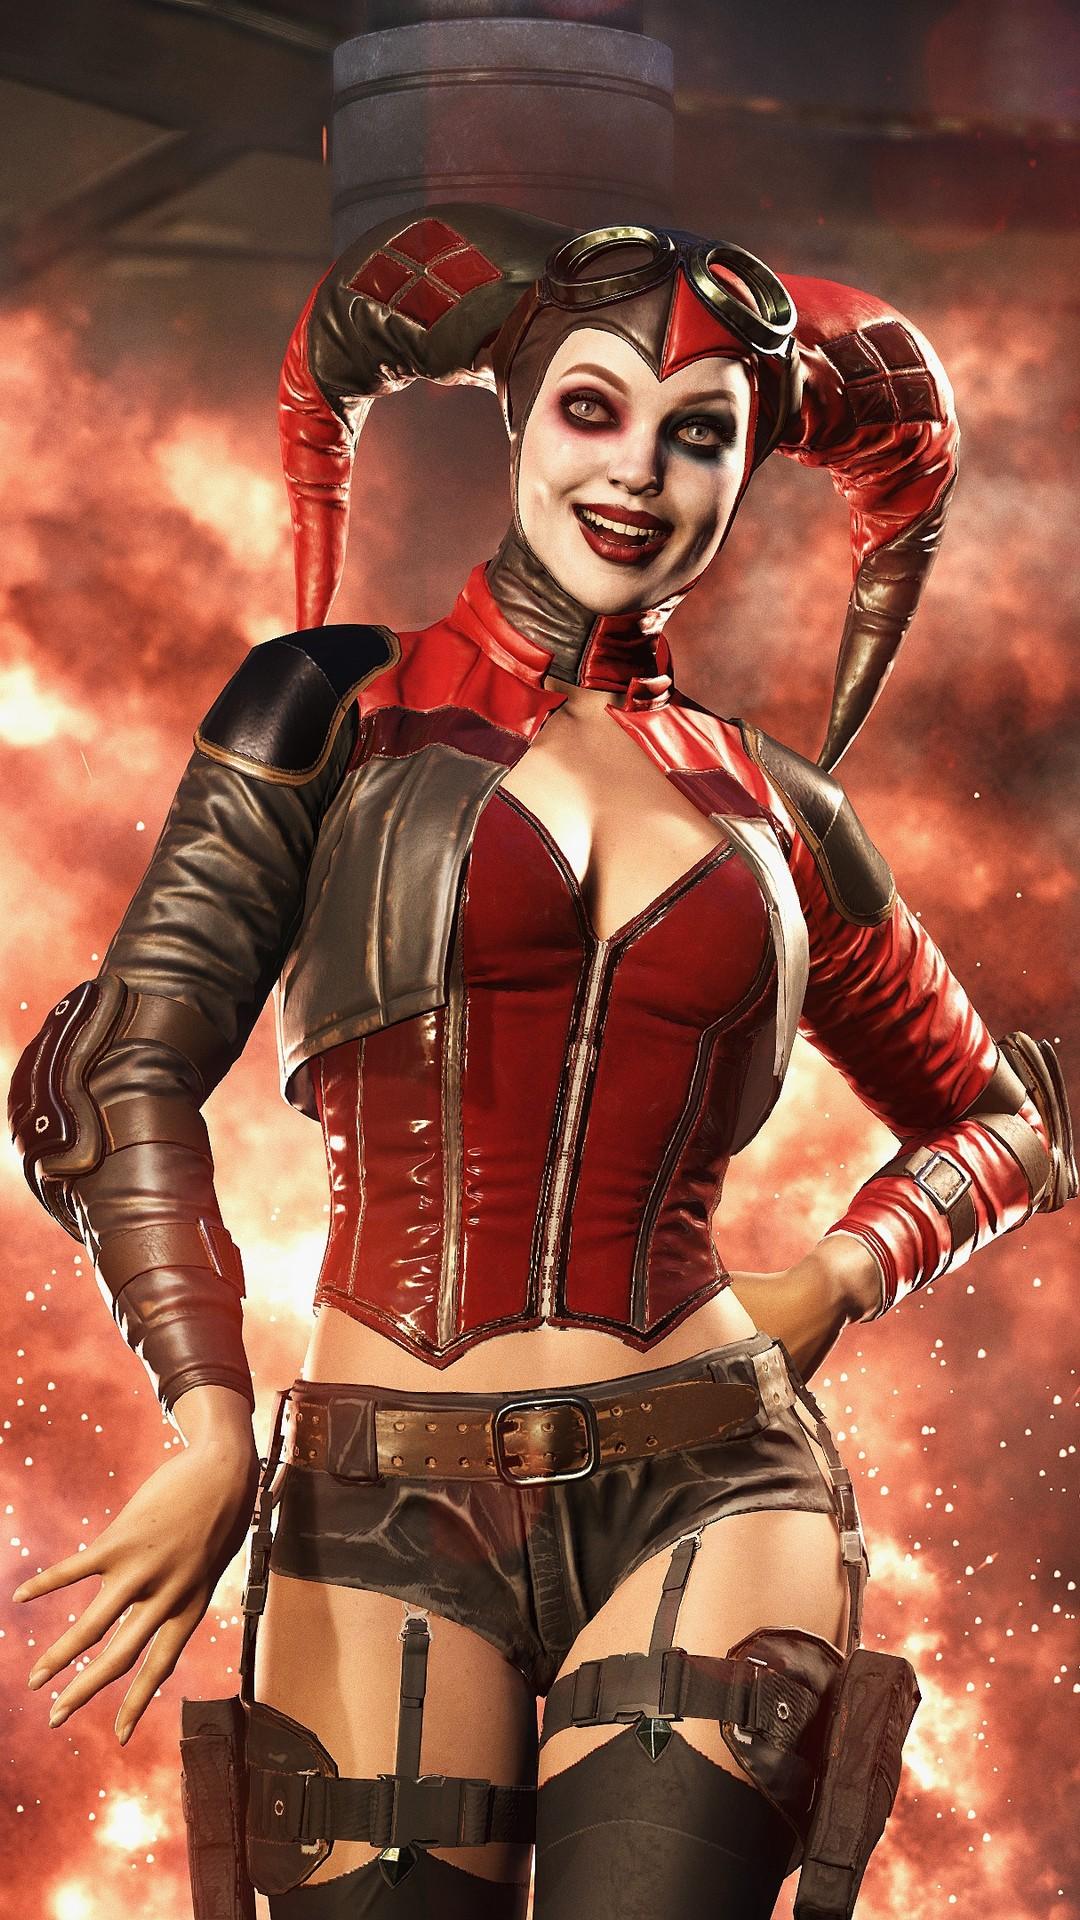 Start Download Harley Quinn Injustice 2 22123 Hd Wallpaper